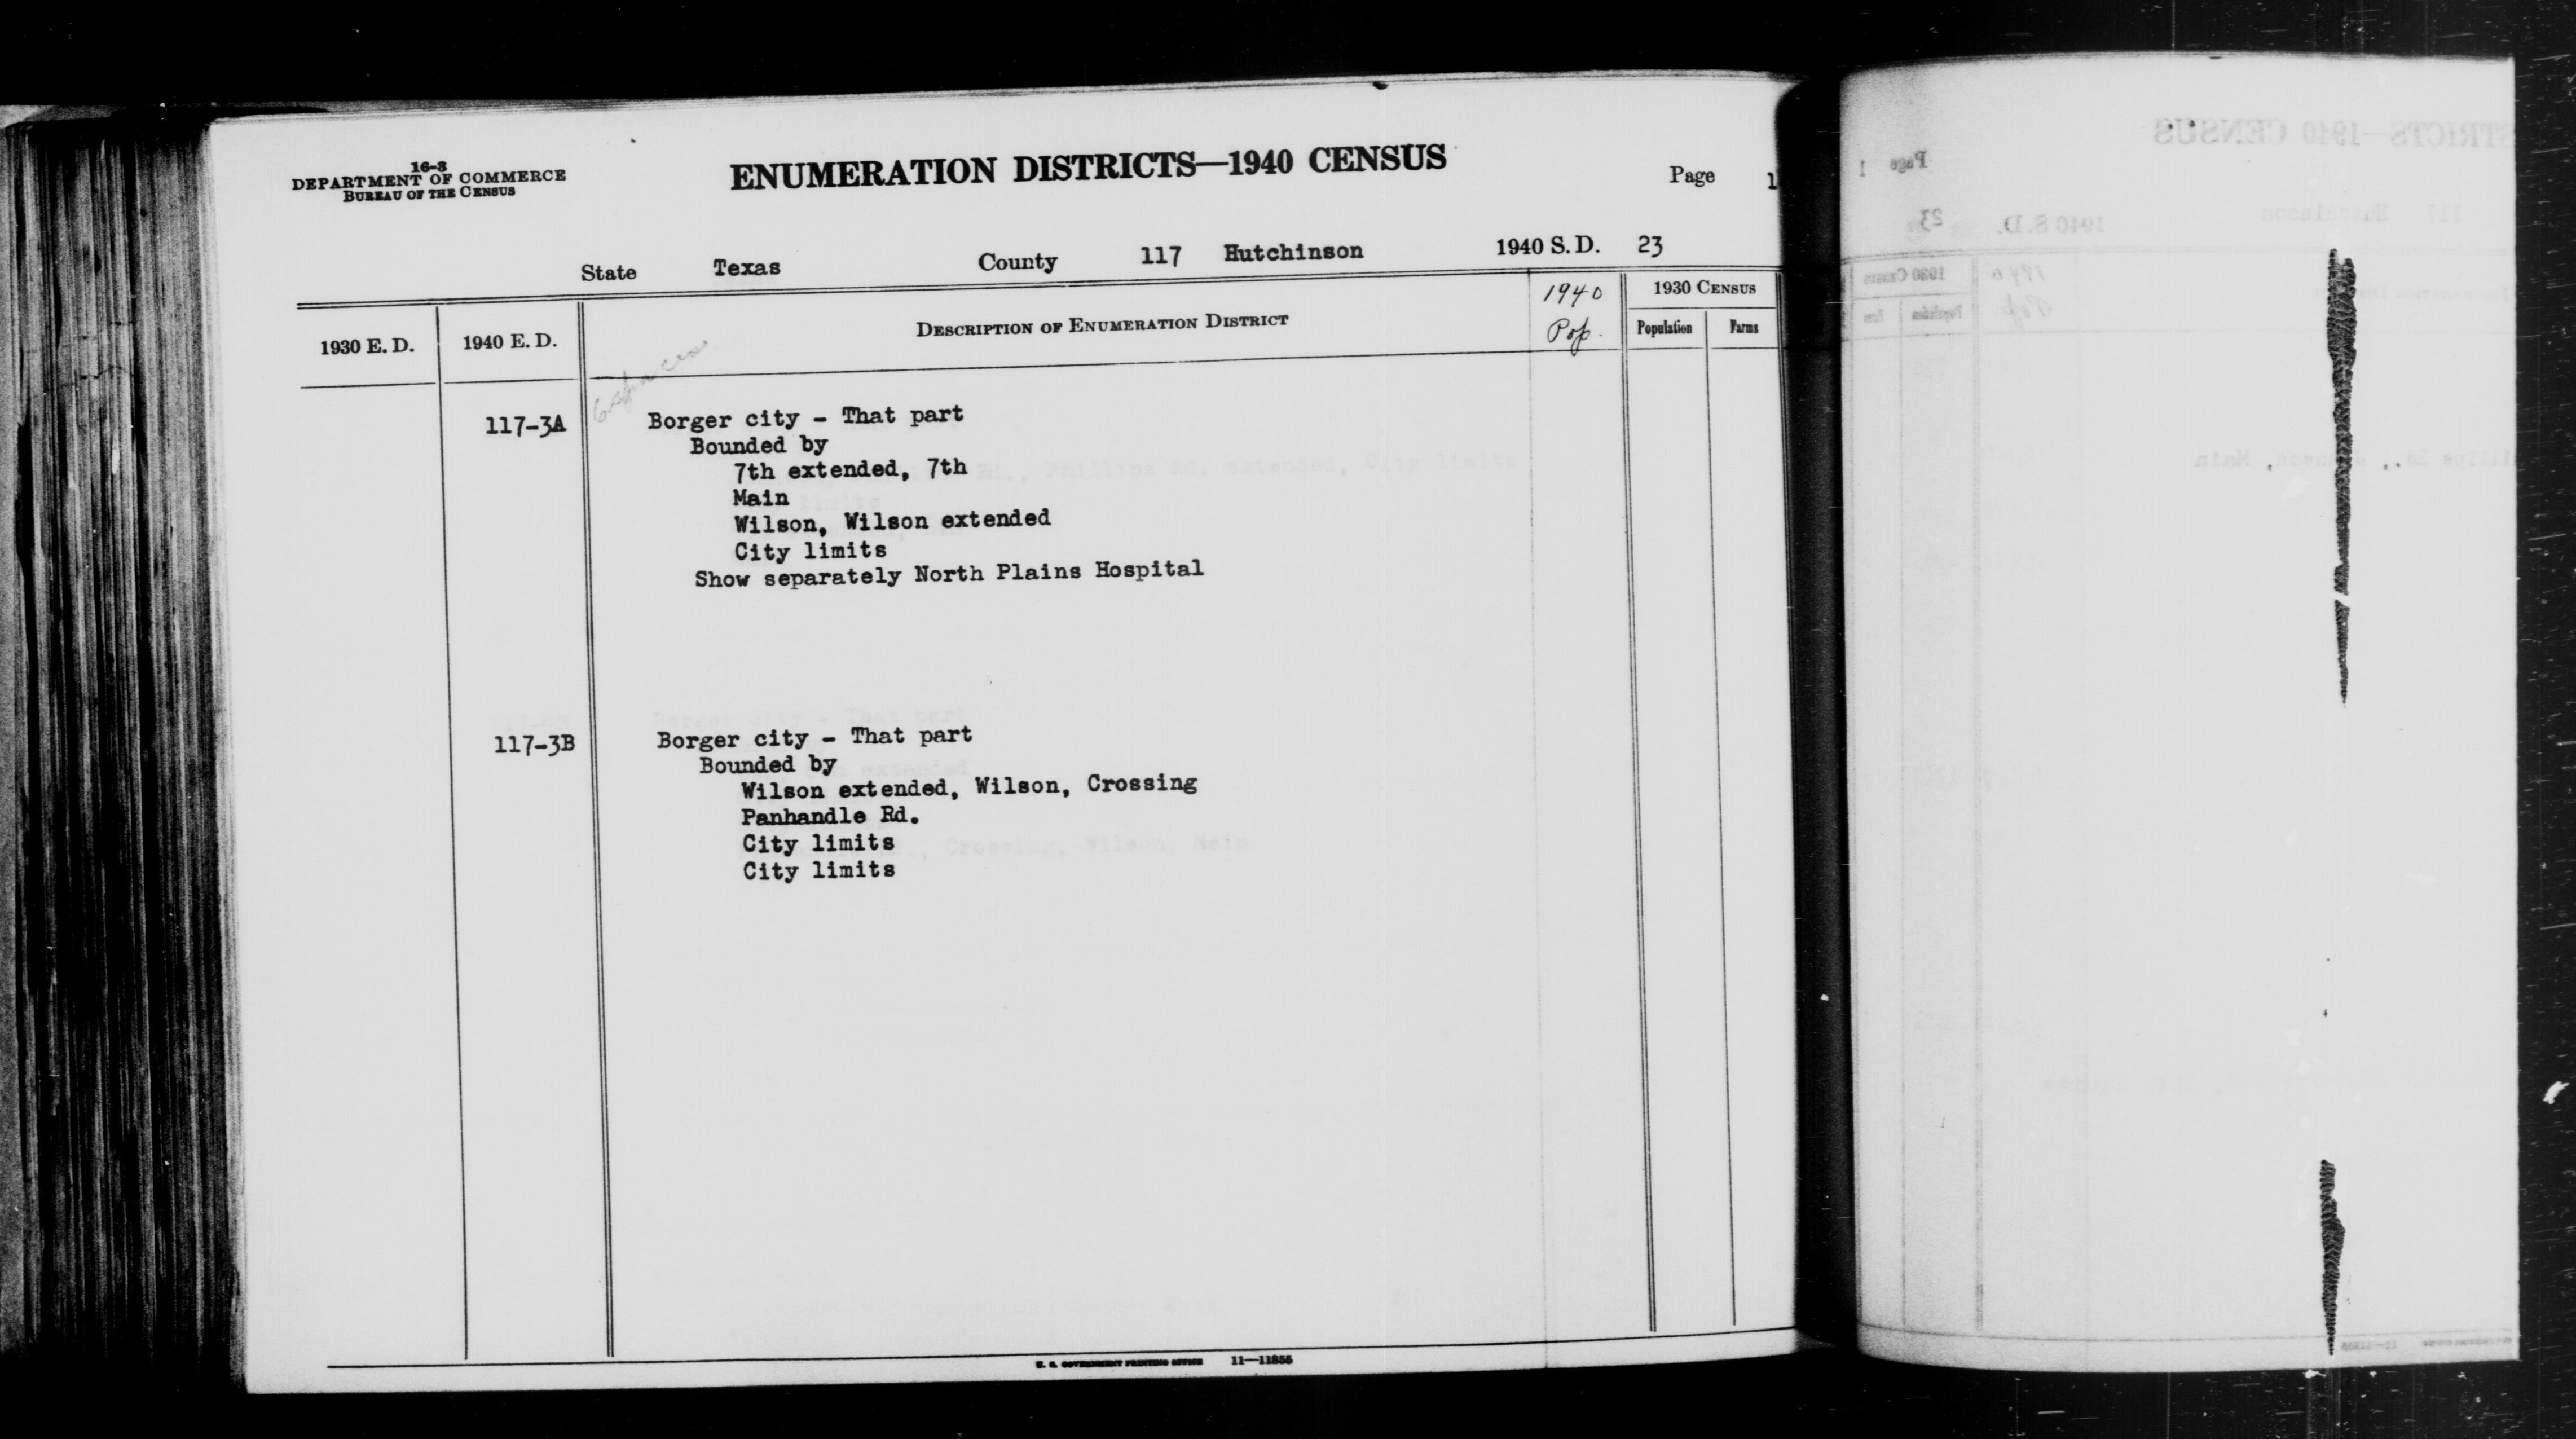 1940 Census Enumeration District Descriptions - Texas - Hutchinson County - ED 117-3A, ED 117-3B